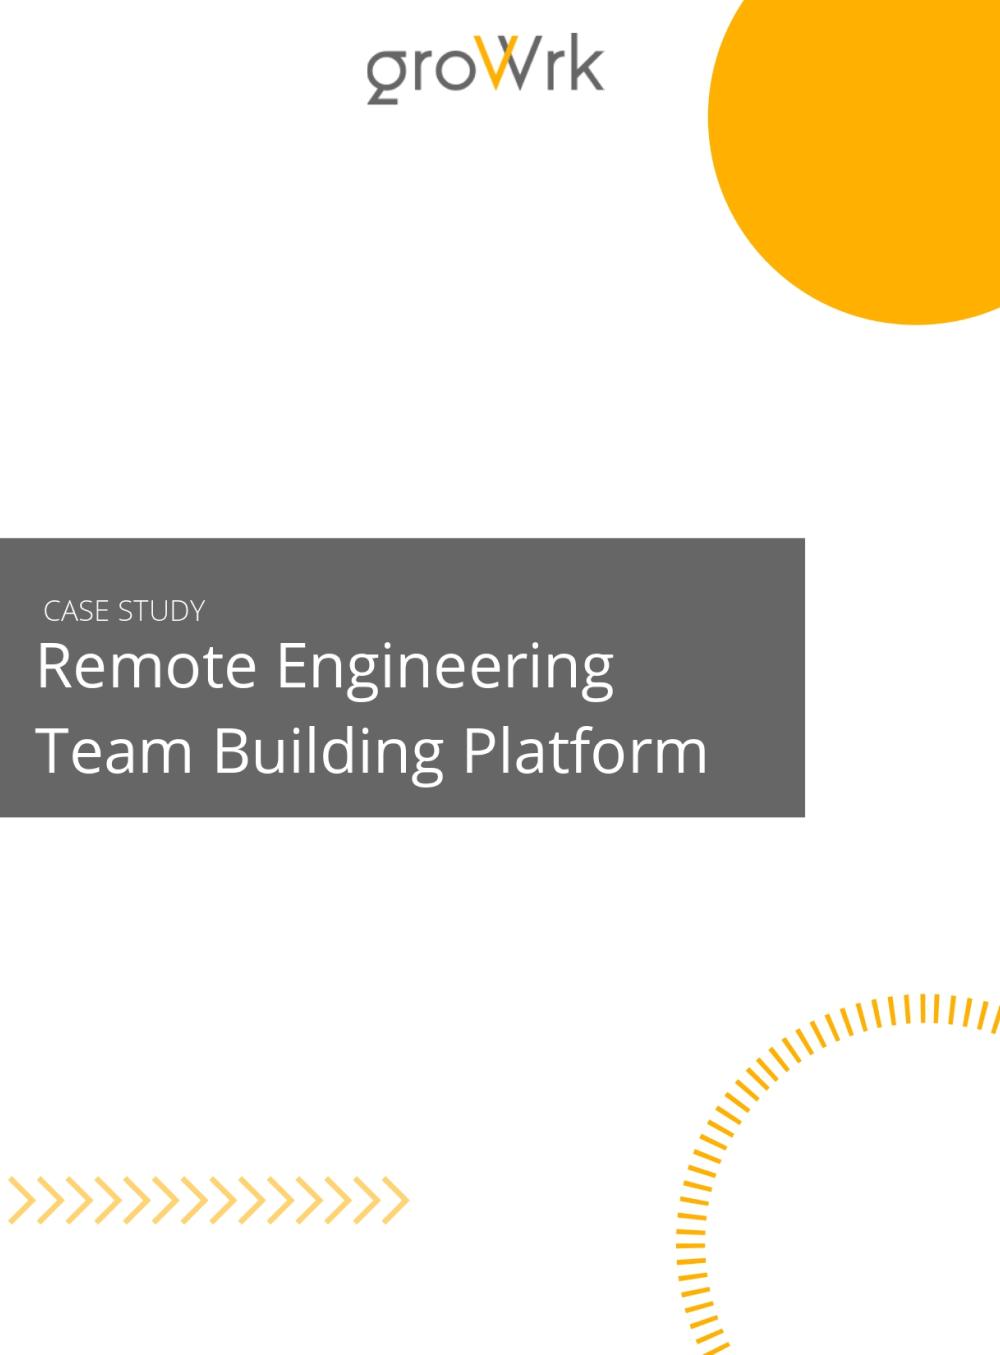 Remote Engineering Team Building Platform